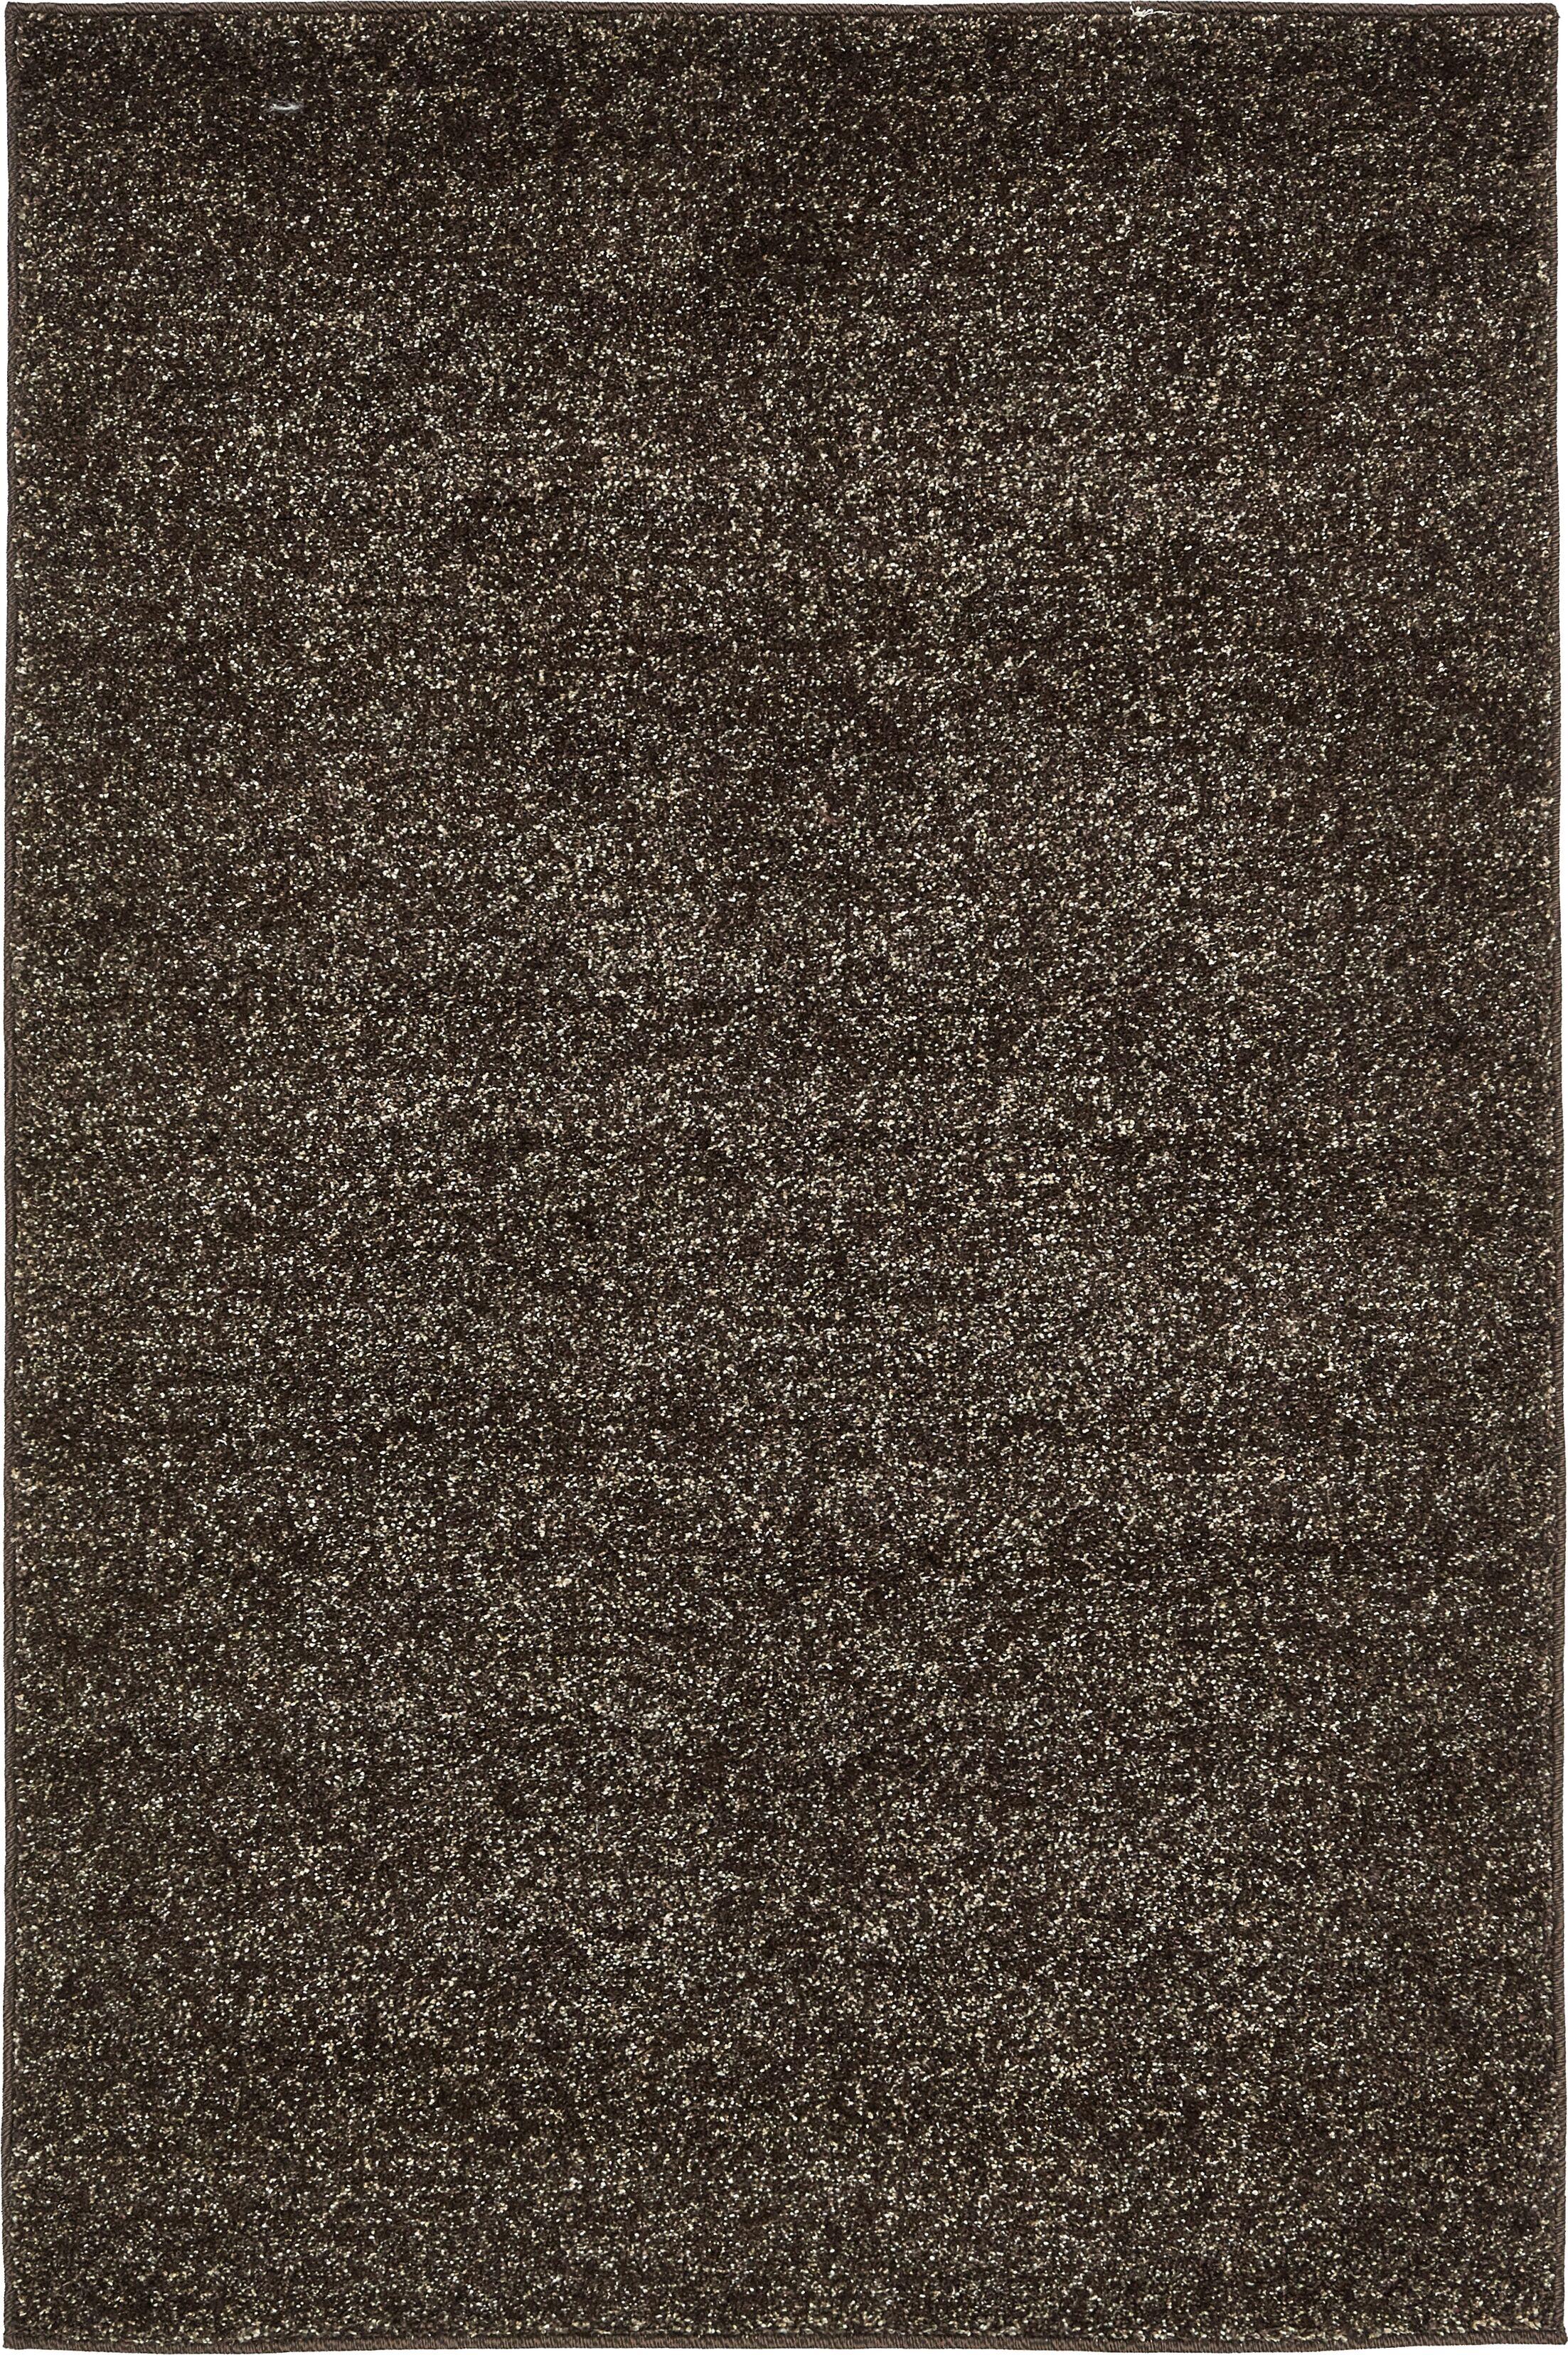 St Philips Marsh Brown Area Rug Rug Size: Rectangle 4' x 6'